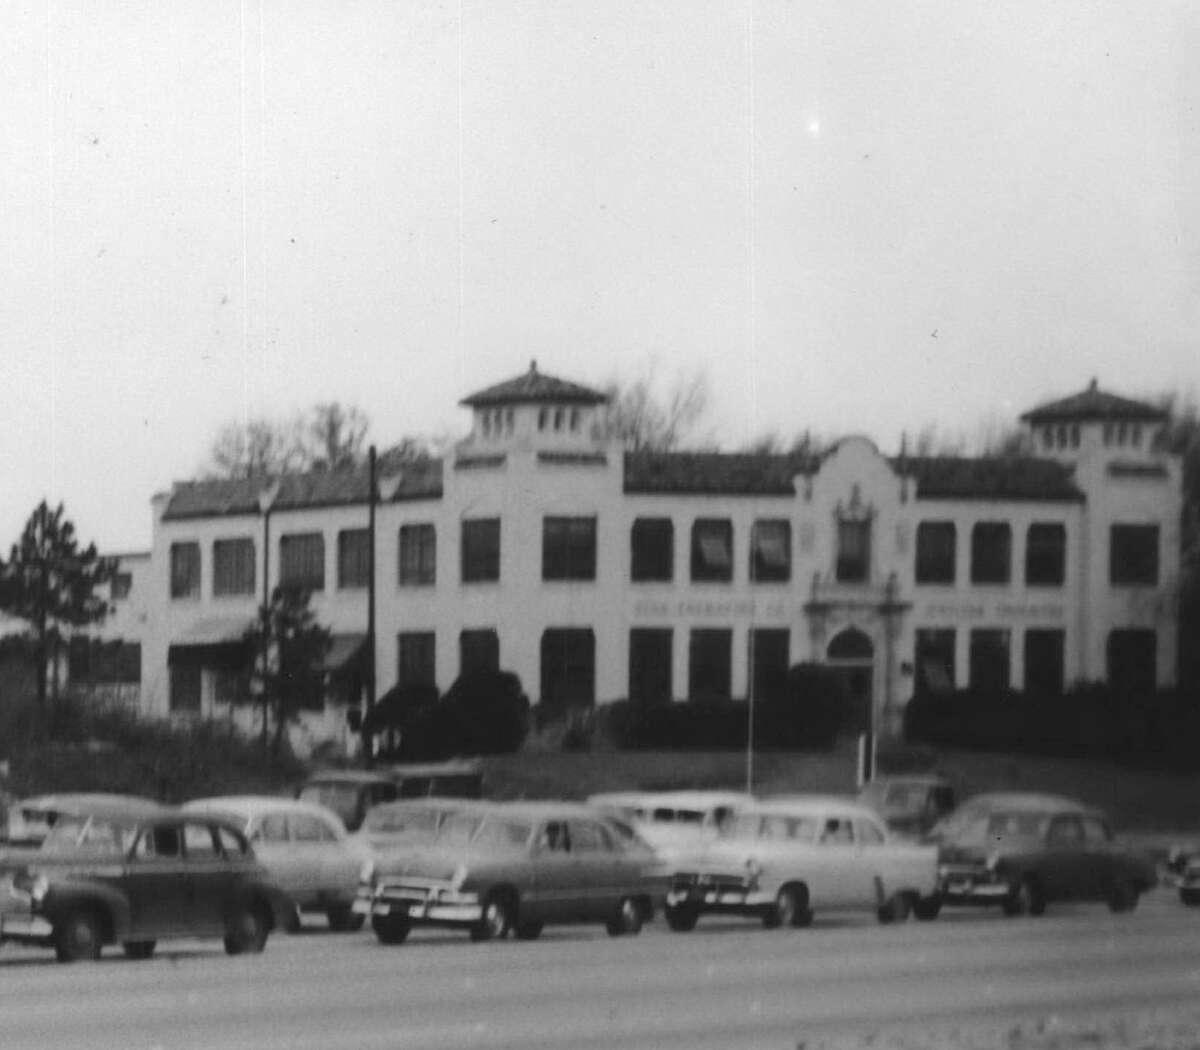 Star Engraving Company Building. 1953 traffic jam along Buffalo Drive, now Allen Parkway, near Waugh.